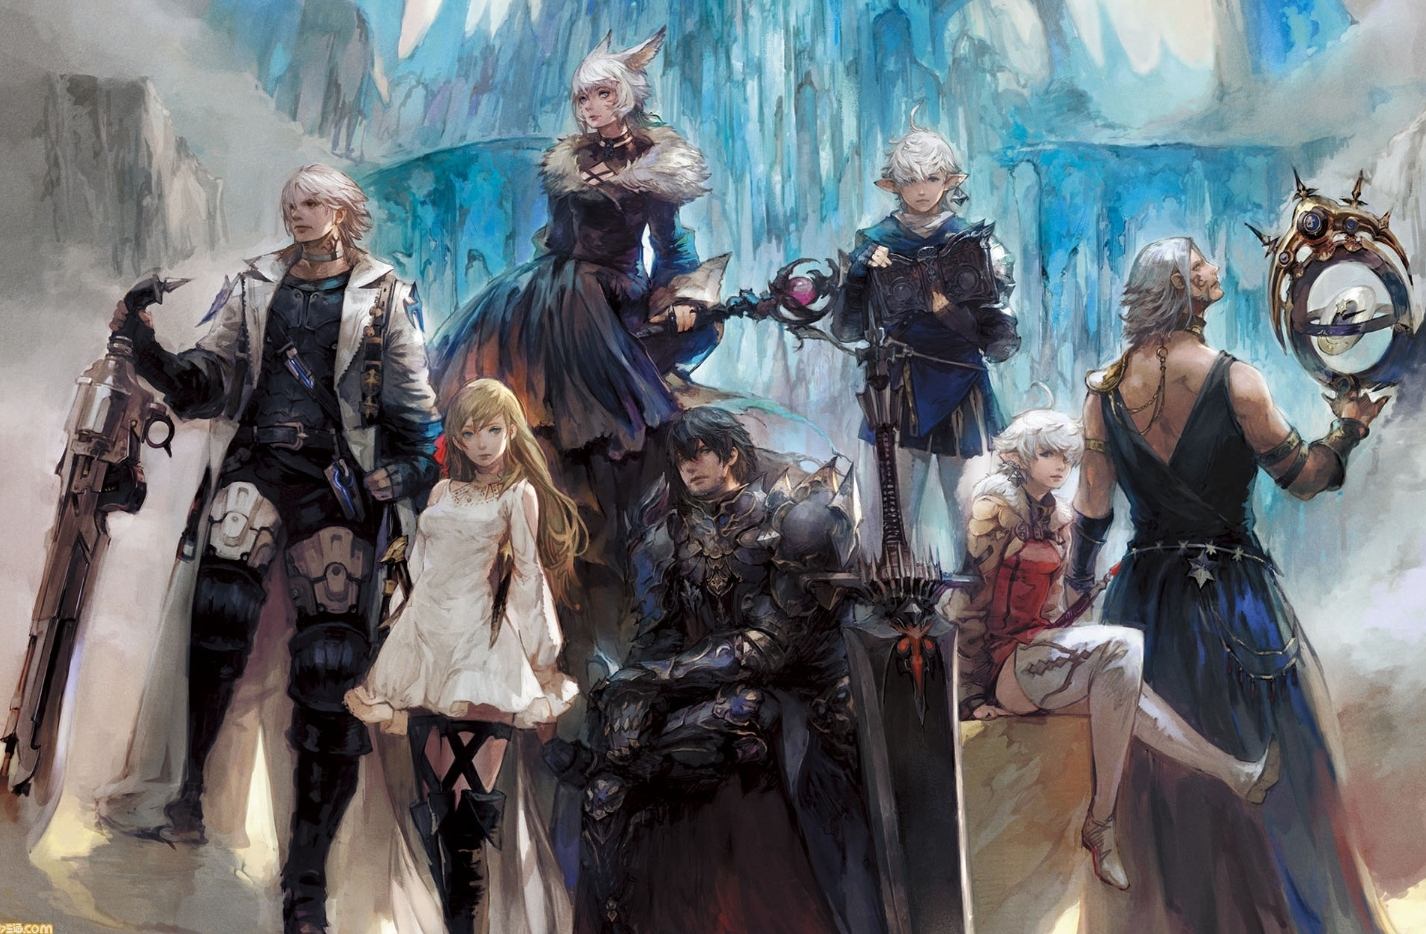 OUC0bE0 - 【悲報】スクエニ、FF16の発売とルミナスによる新作OW RPGを発表予定。